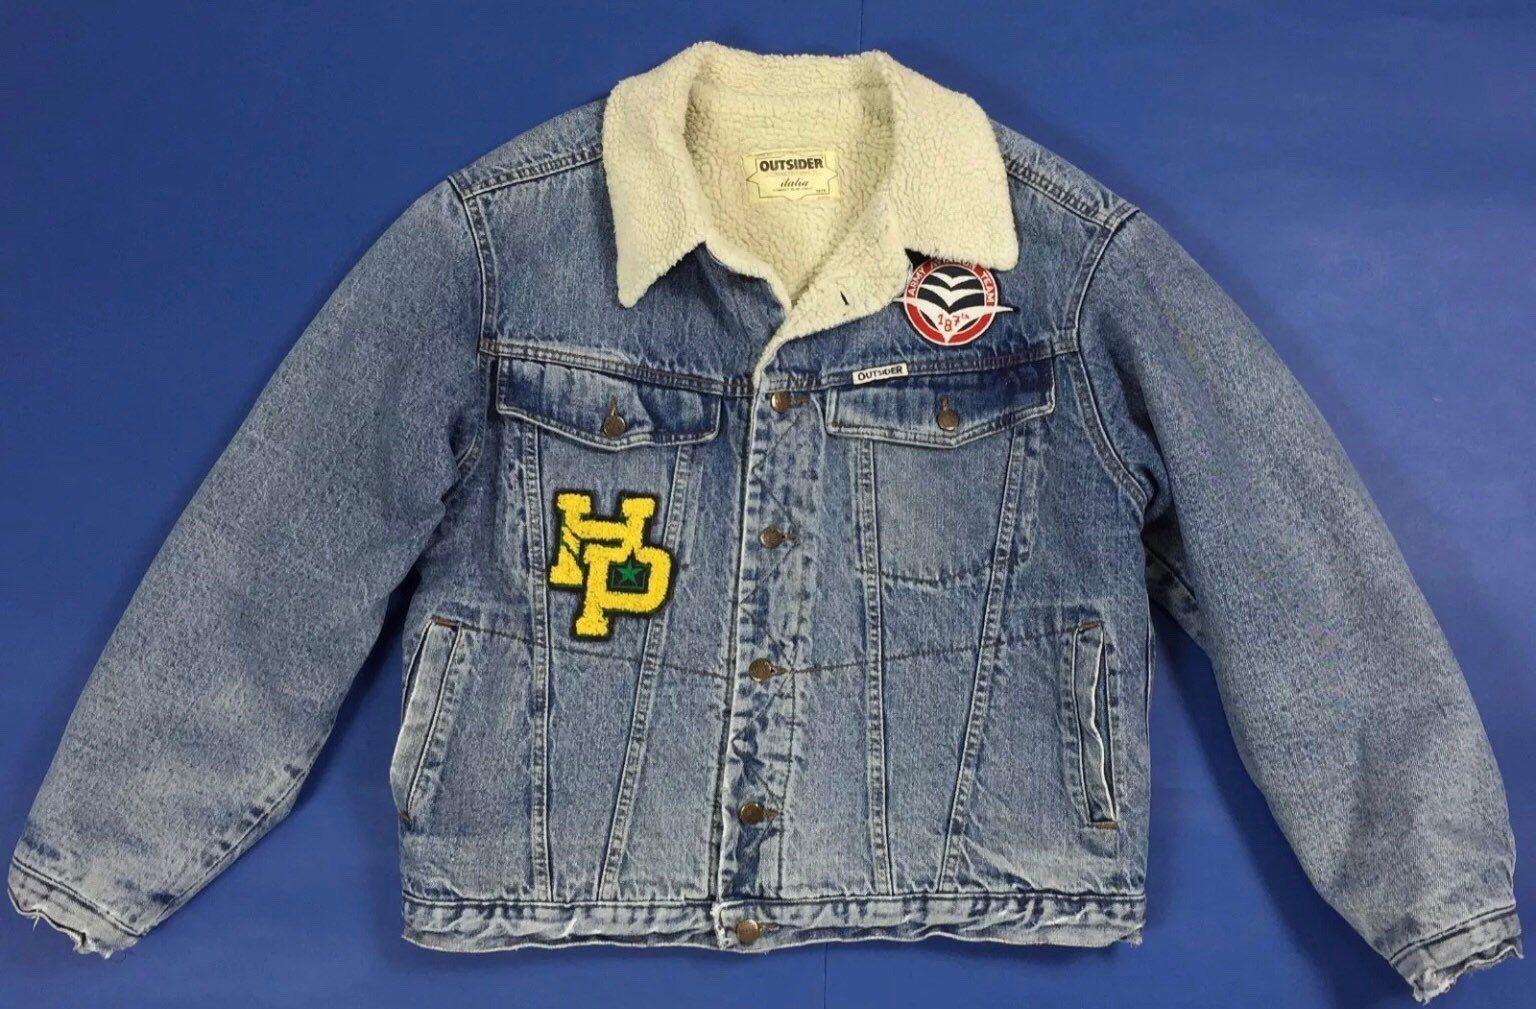 buy popular 37b73 861aa Outsider giubbotto sherpa giacca jeans XL giubbino imbottito ...